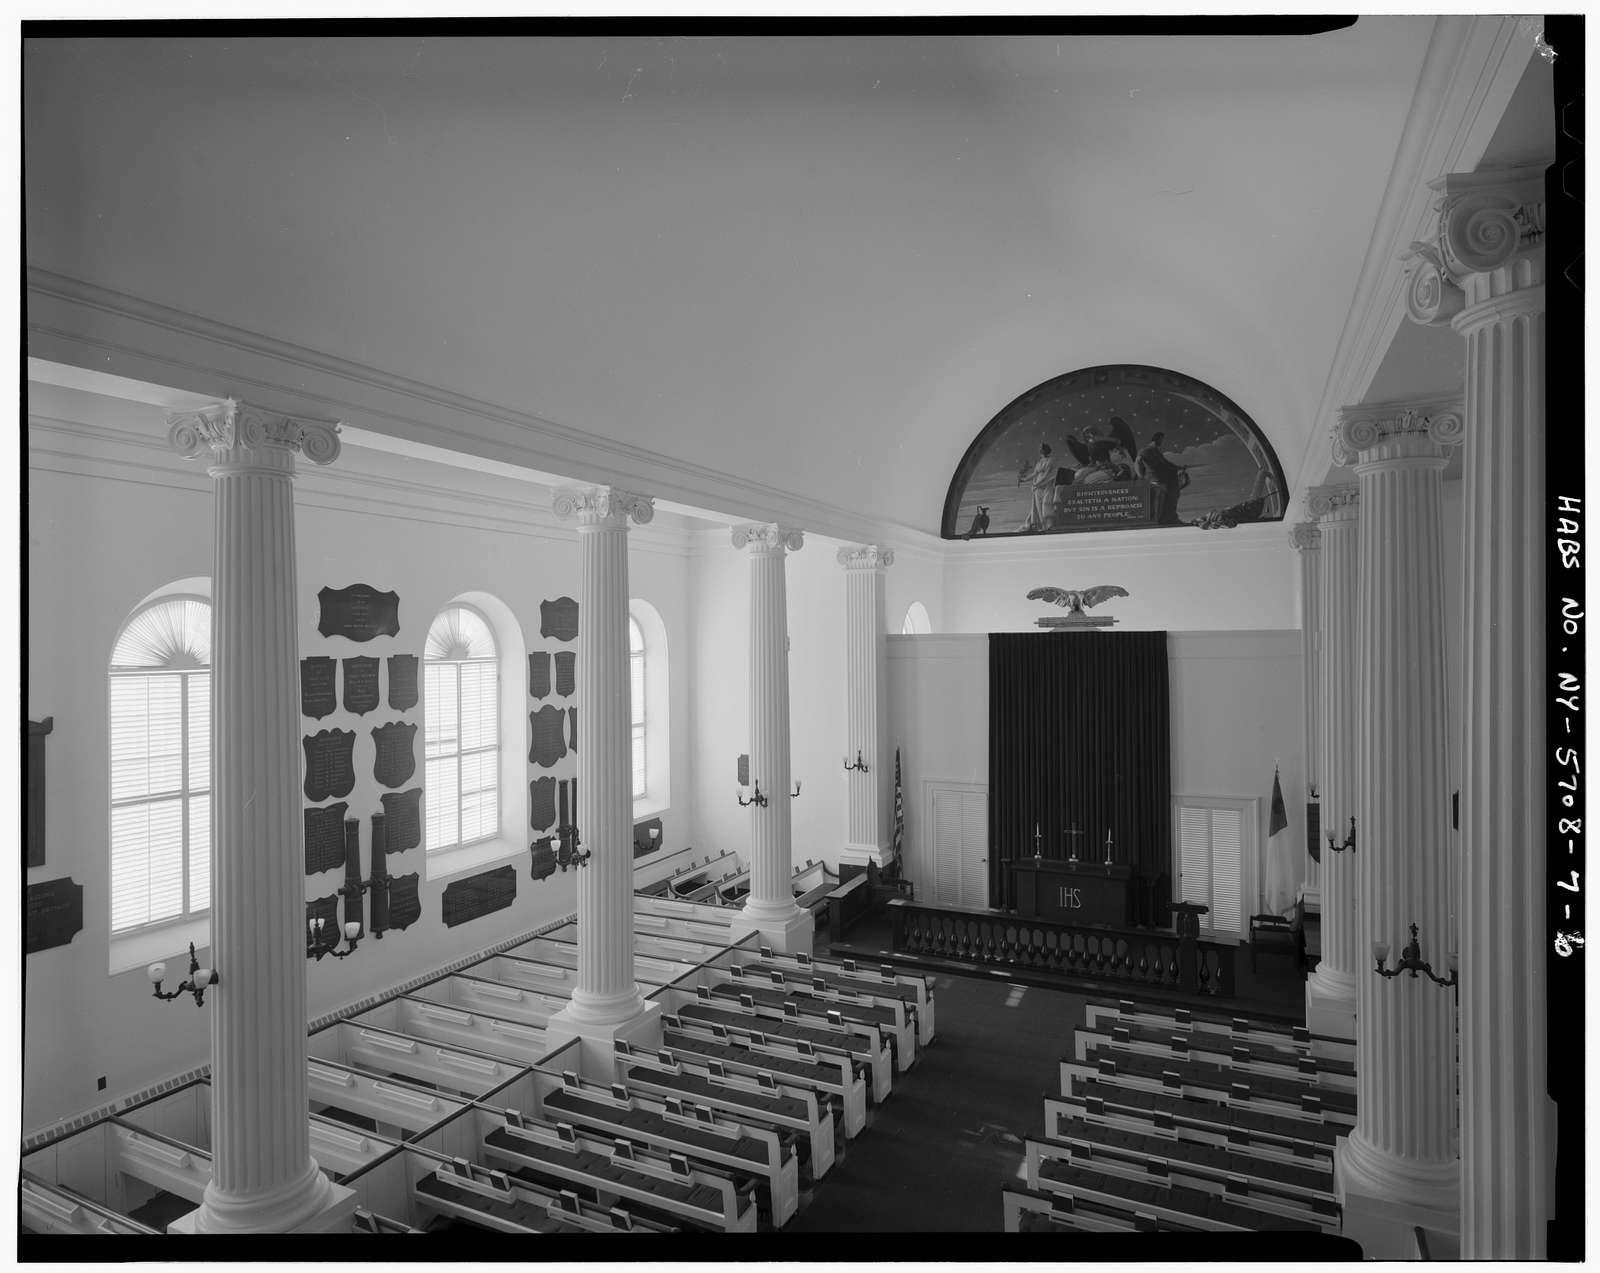 U. S. Military Academy, Cadet Chapel, West Point, Orange County, NY